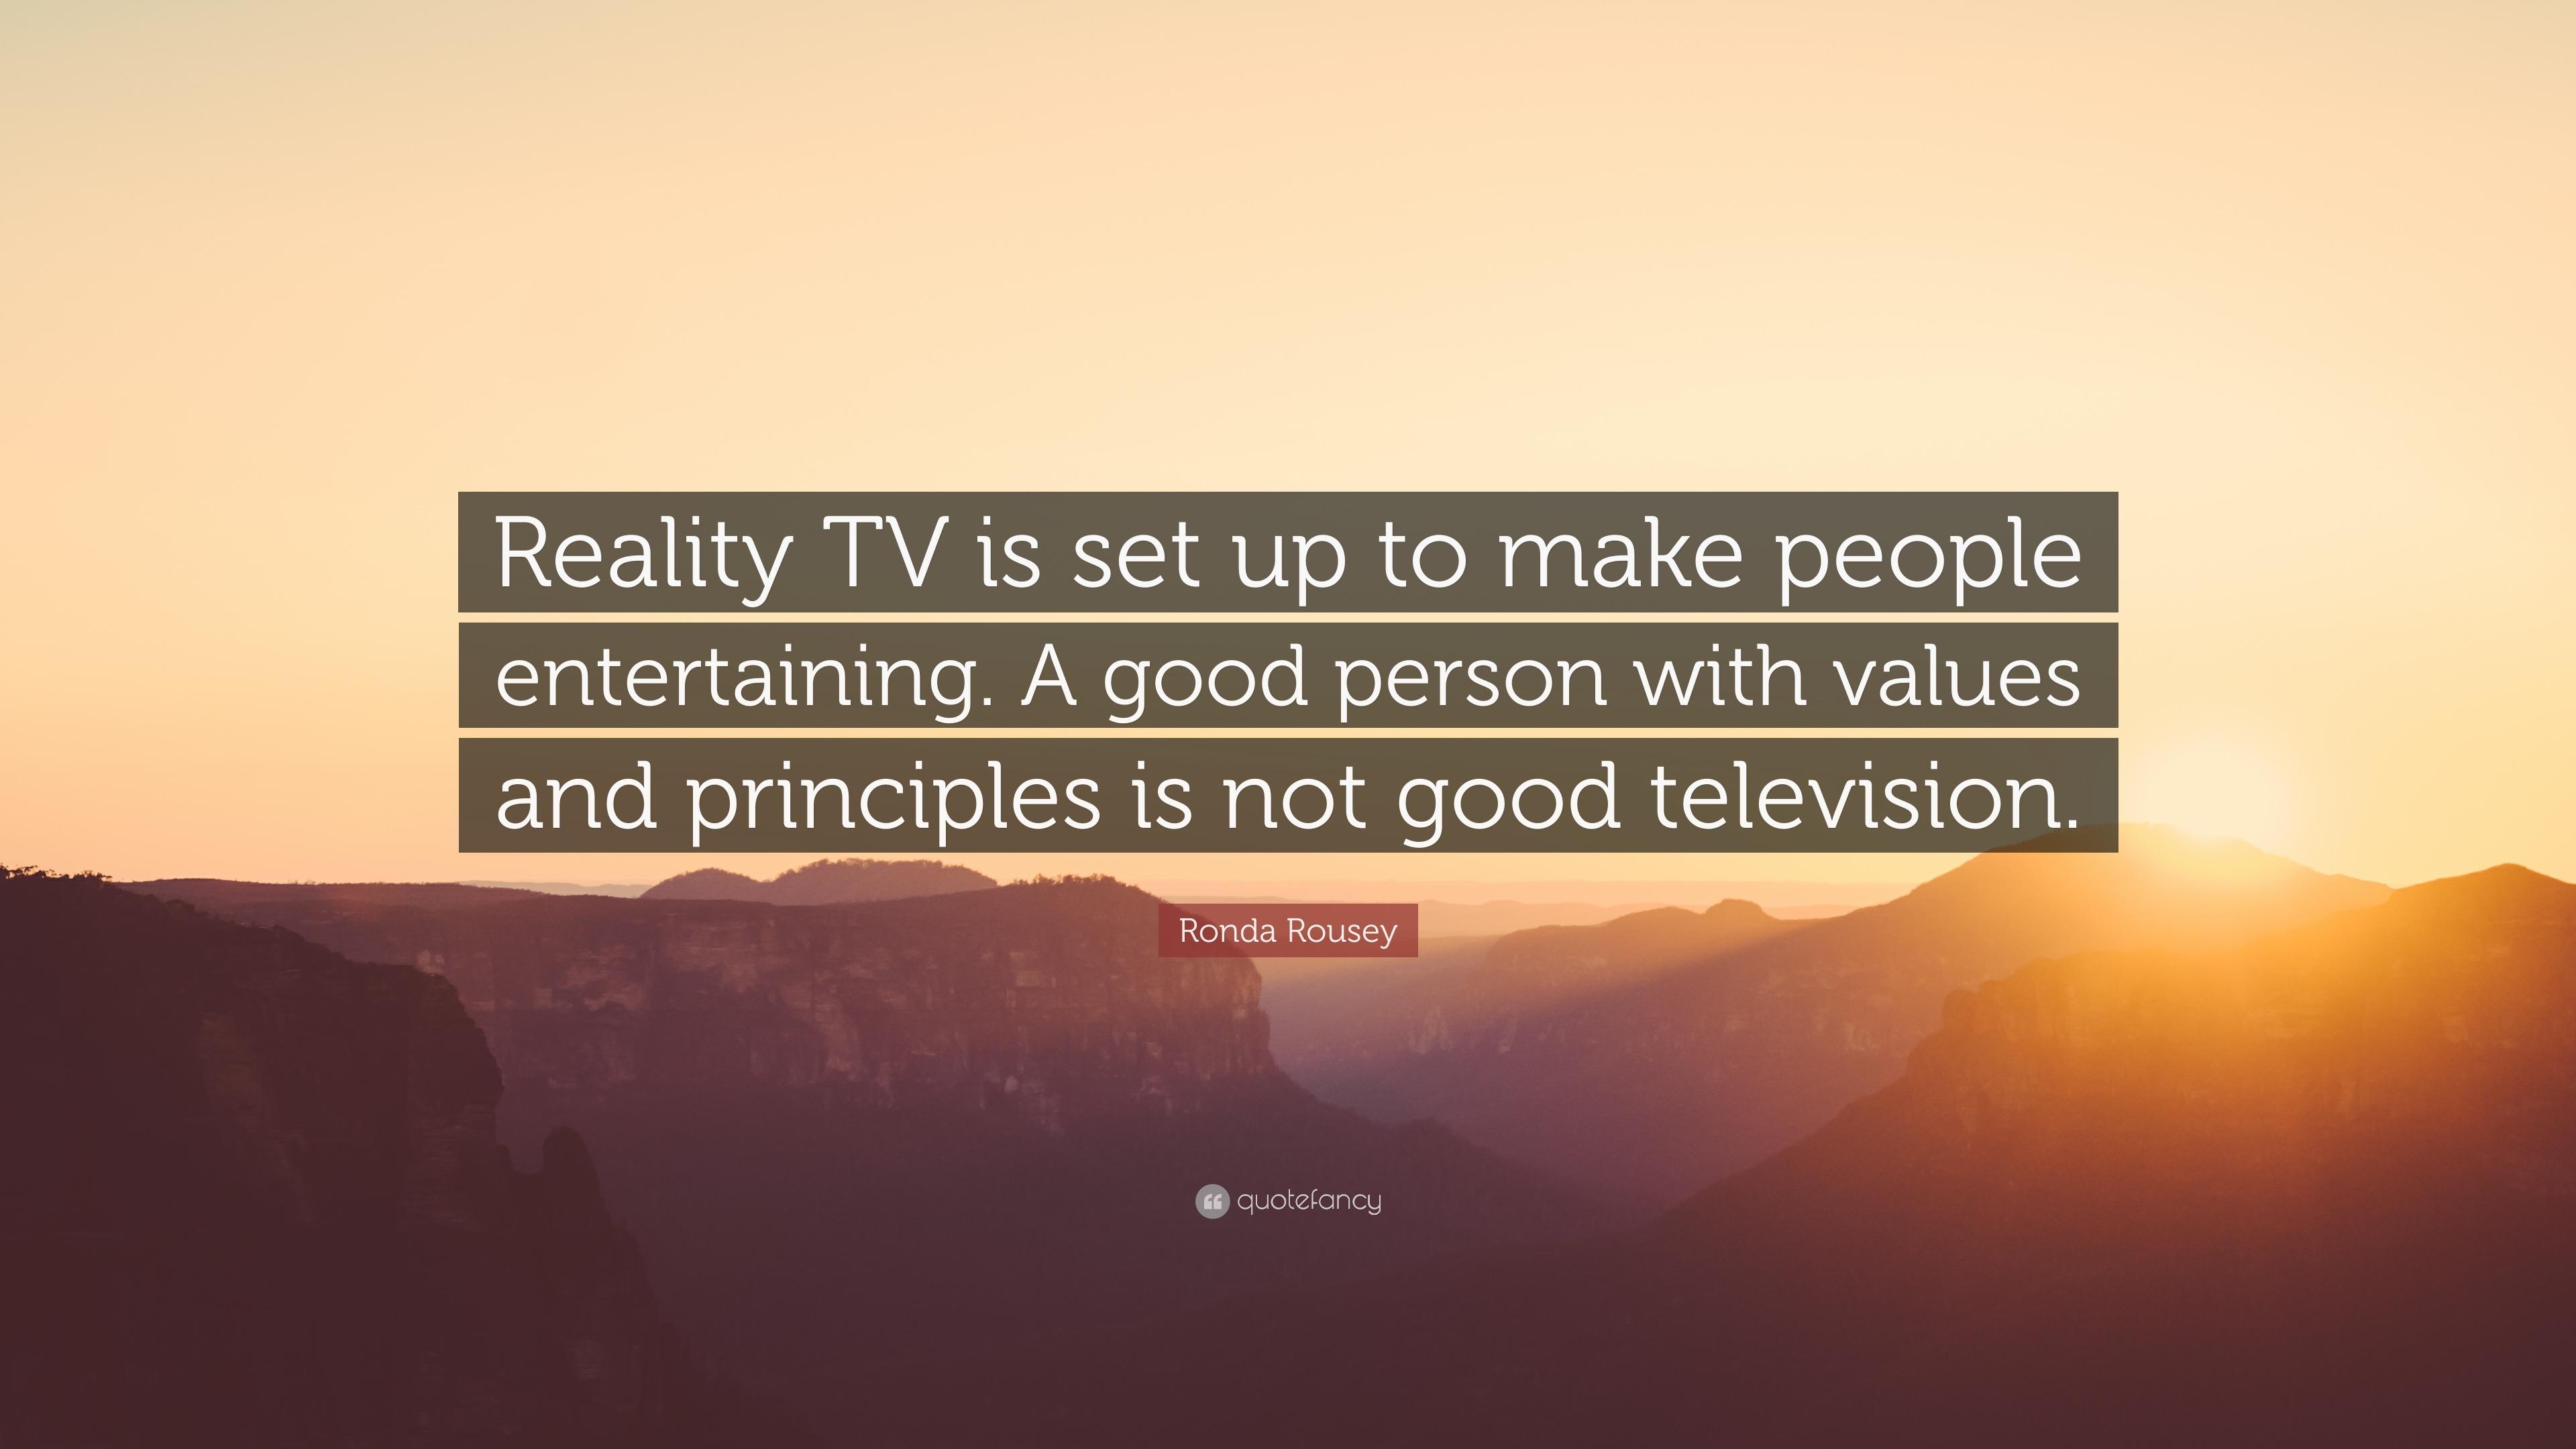 Reality of values 93